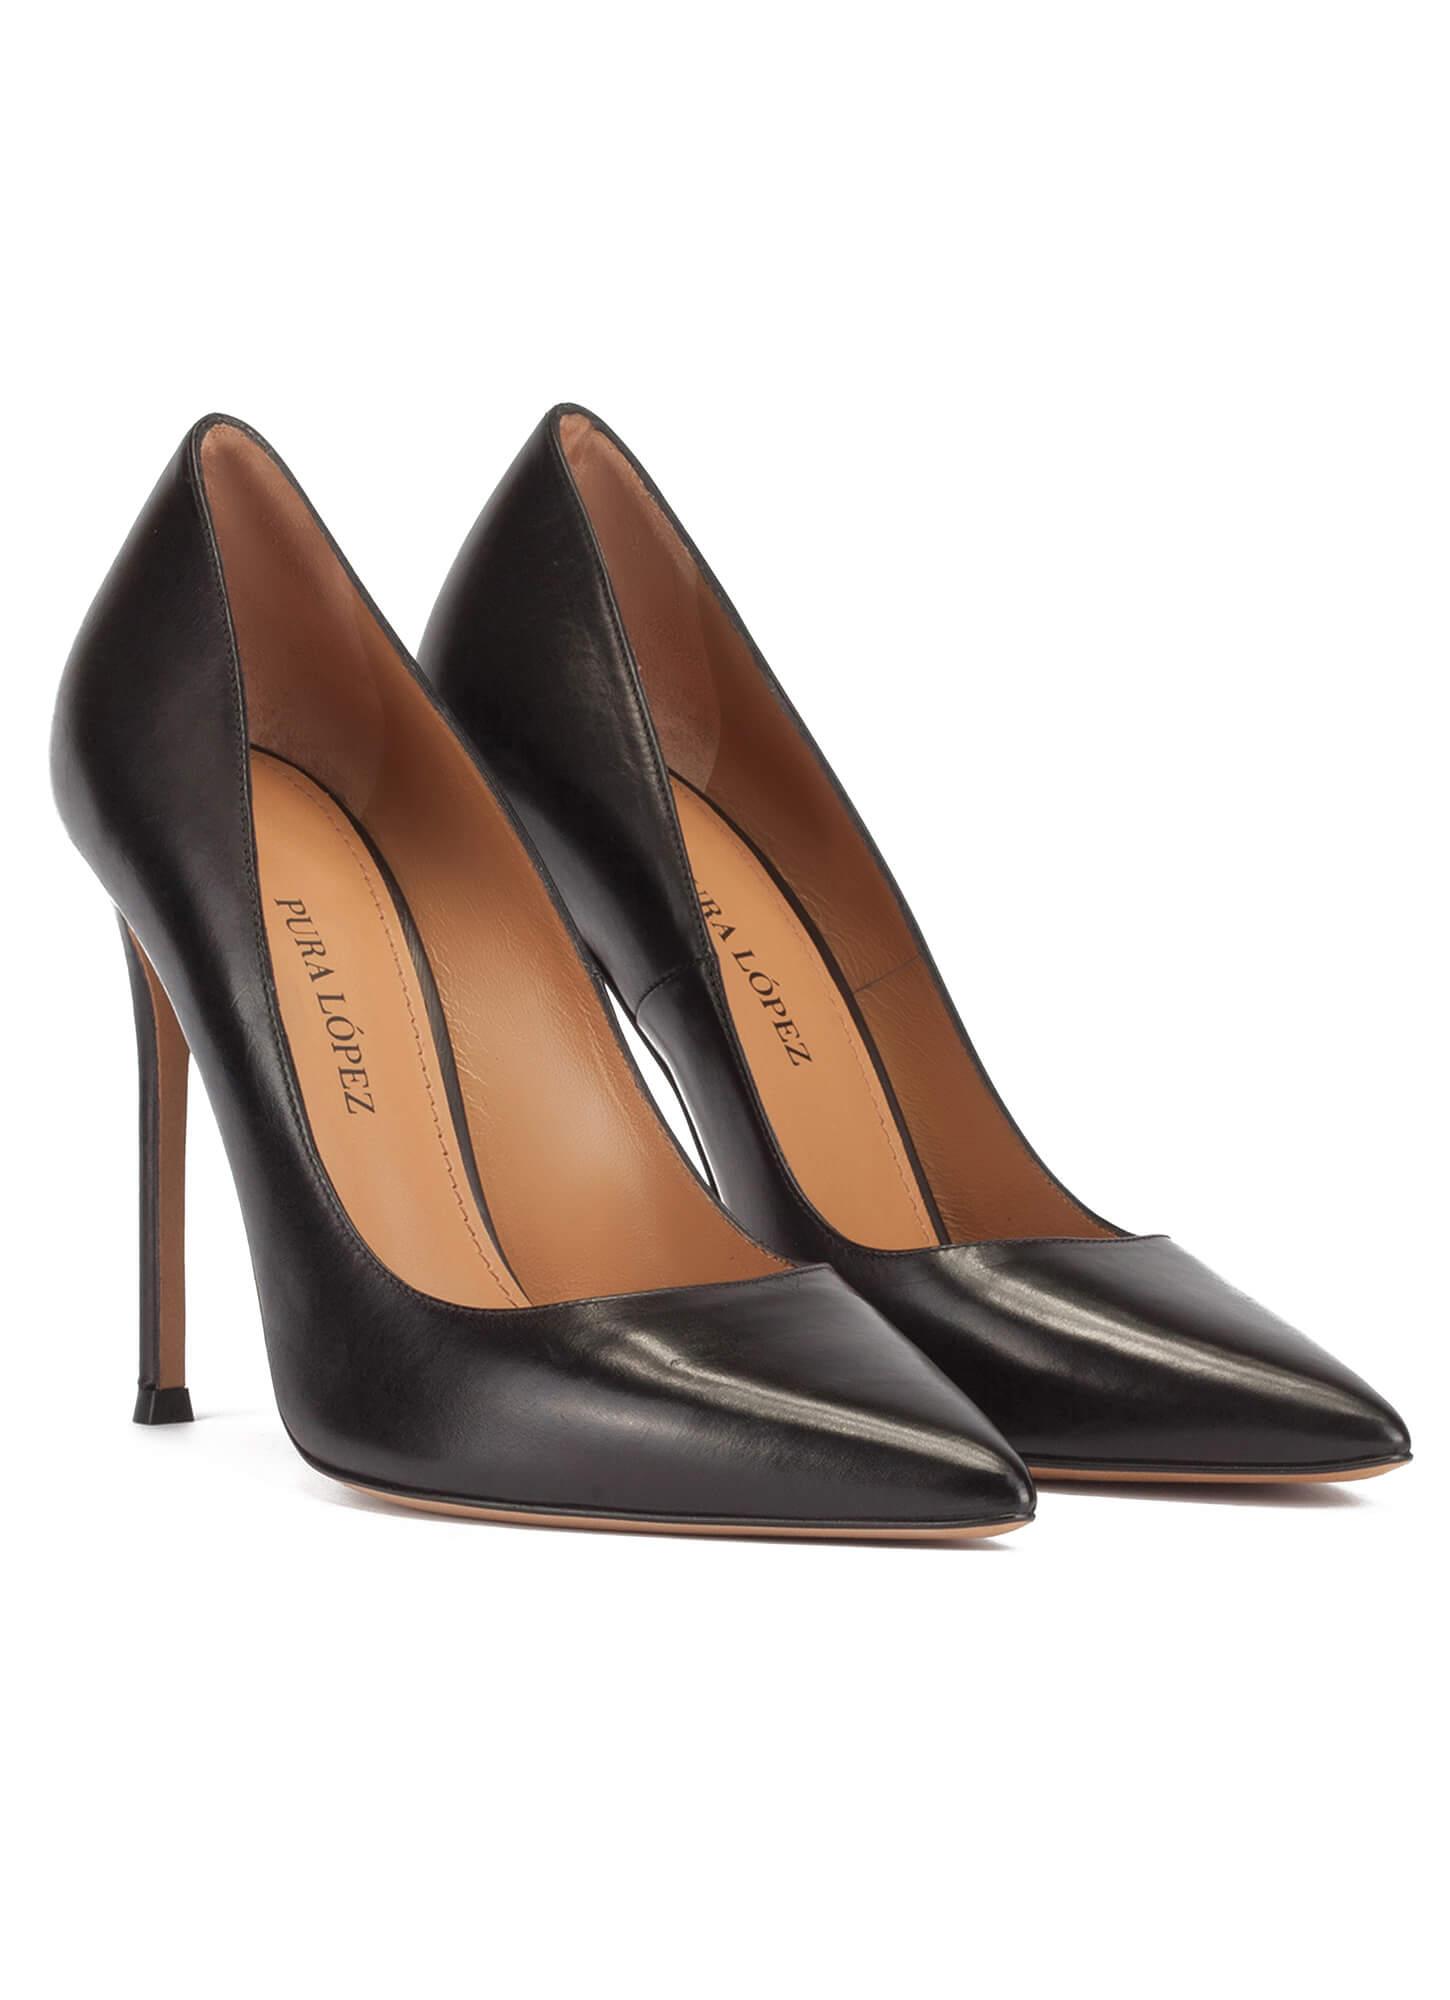 Salon Tacon Salon Alto Zapato Negro Negro Zapato f7vYb6yIg